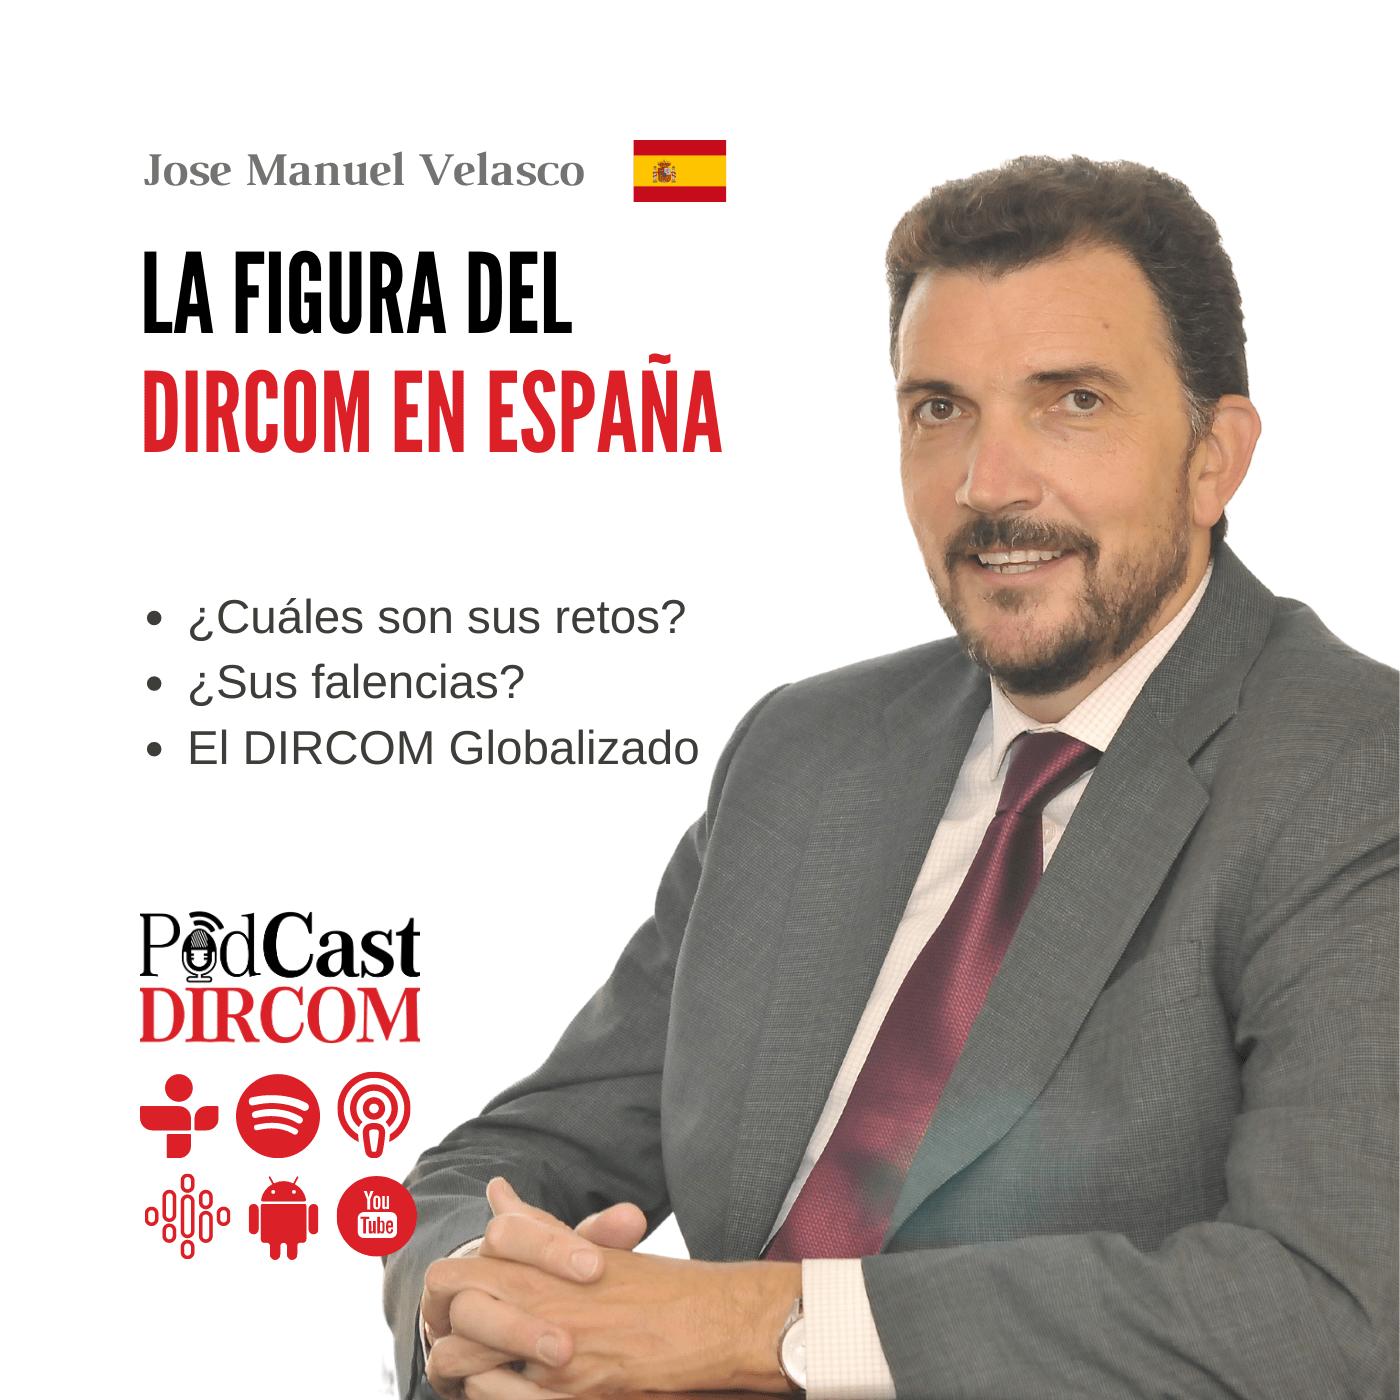 La figura del DirCom en España